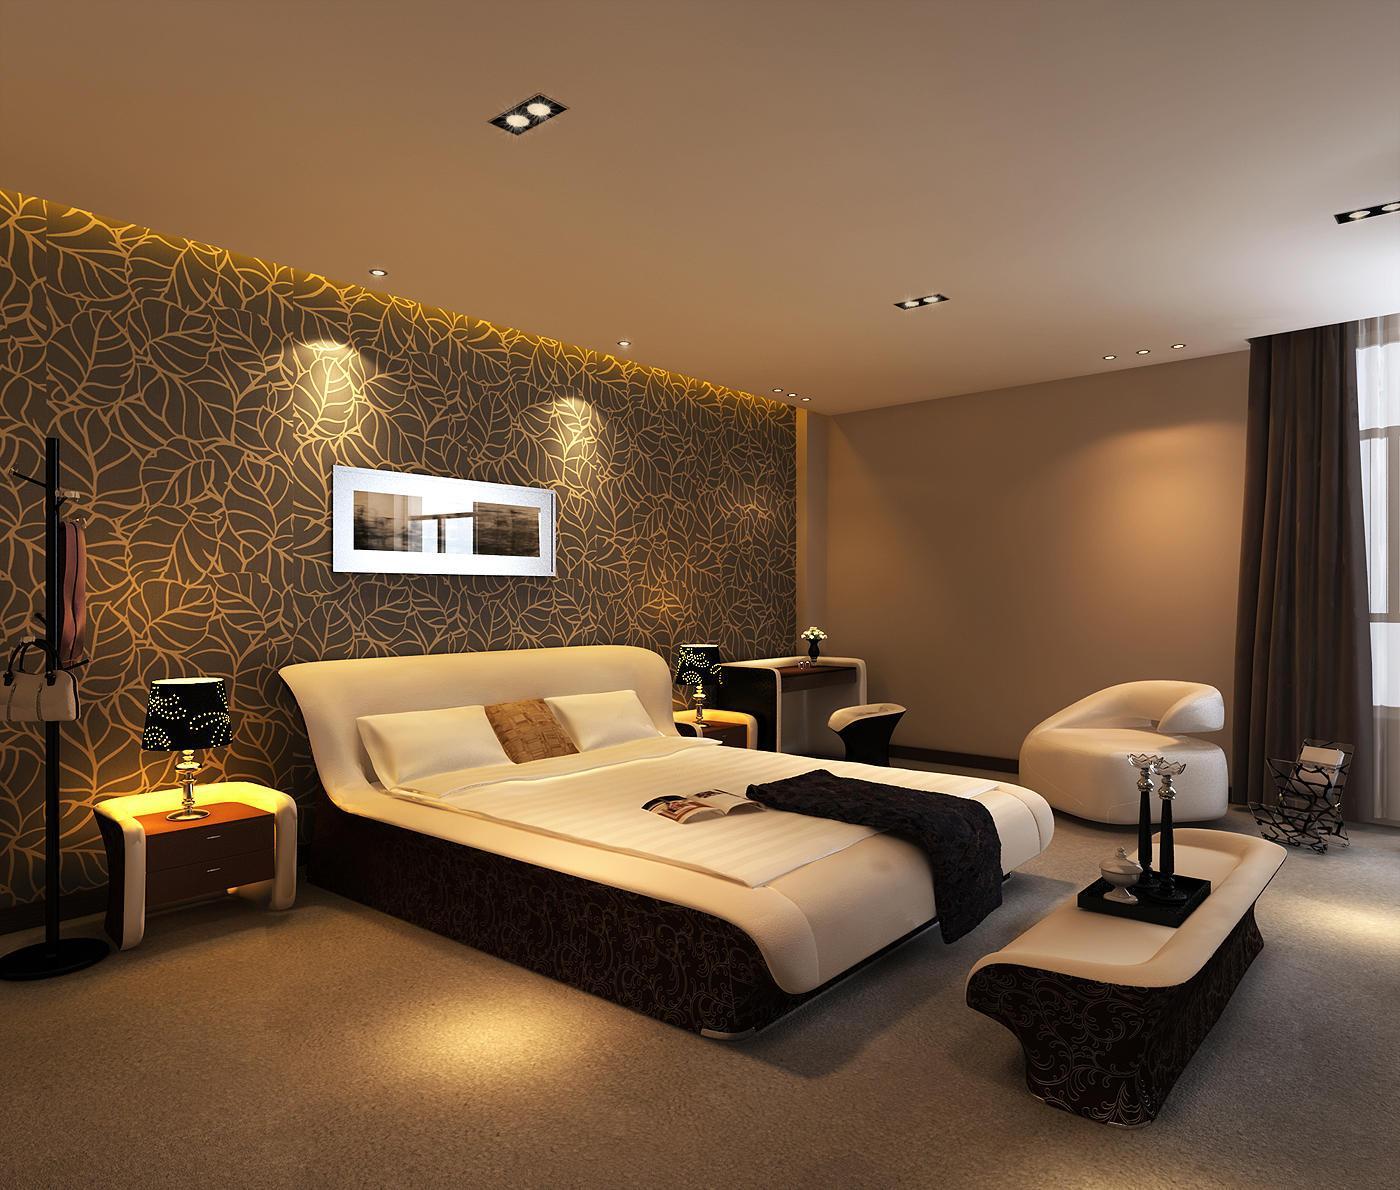 Идеи обоев для спальни фото